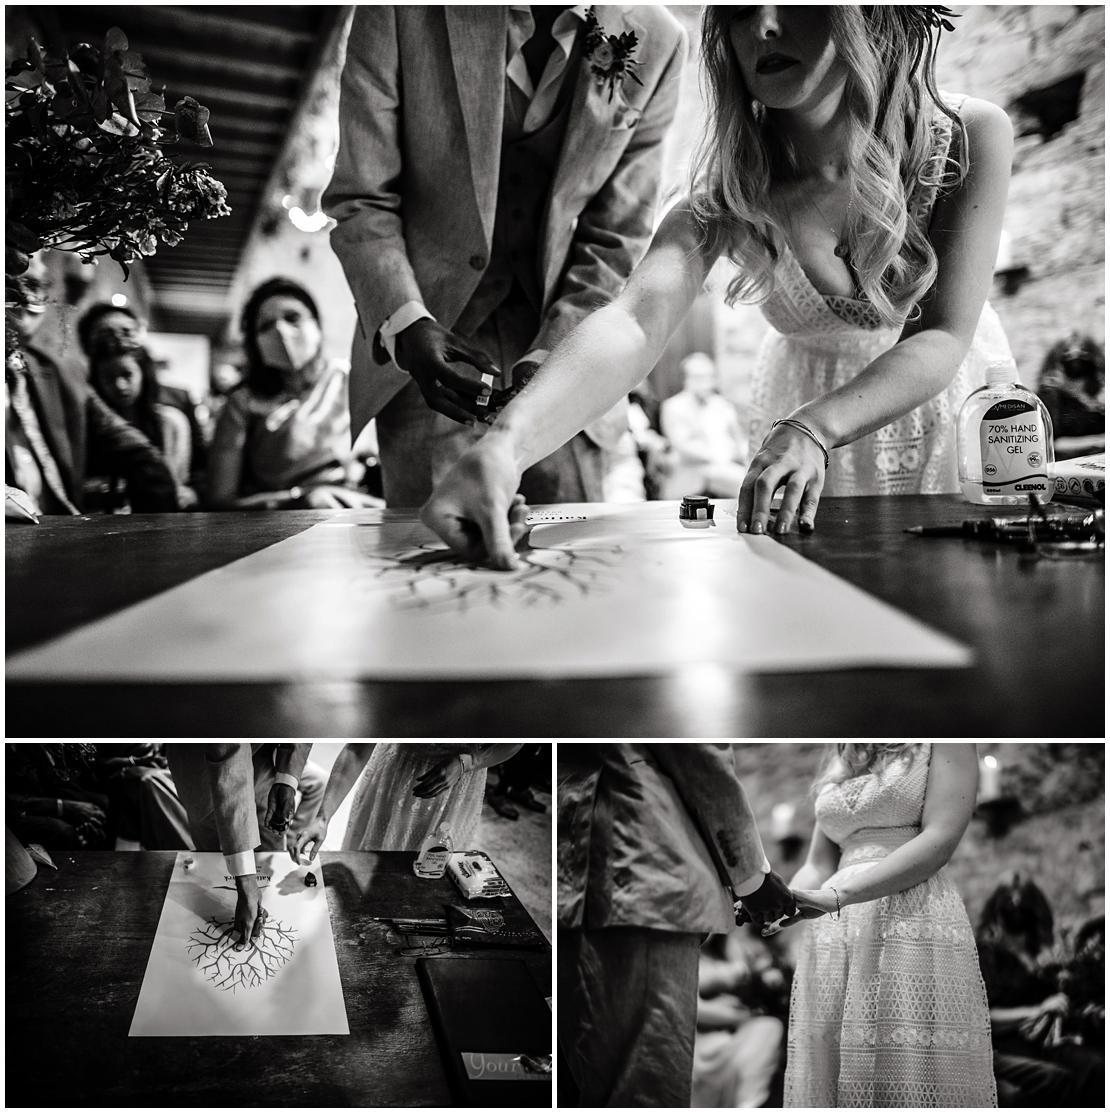 doxford barns wedding photography katie vivek 0036